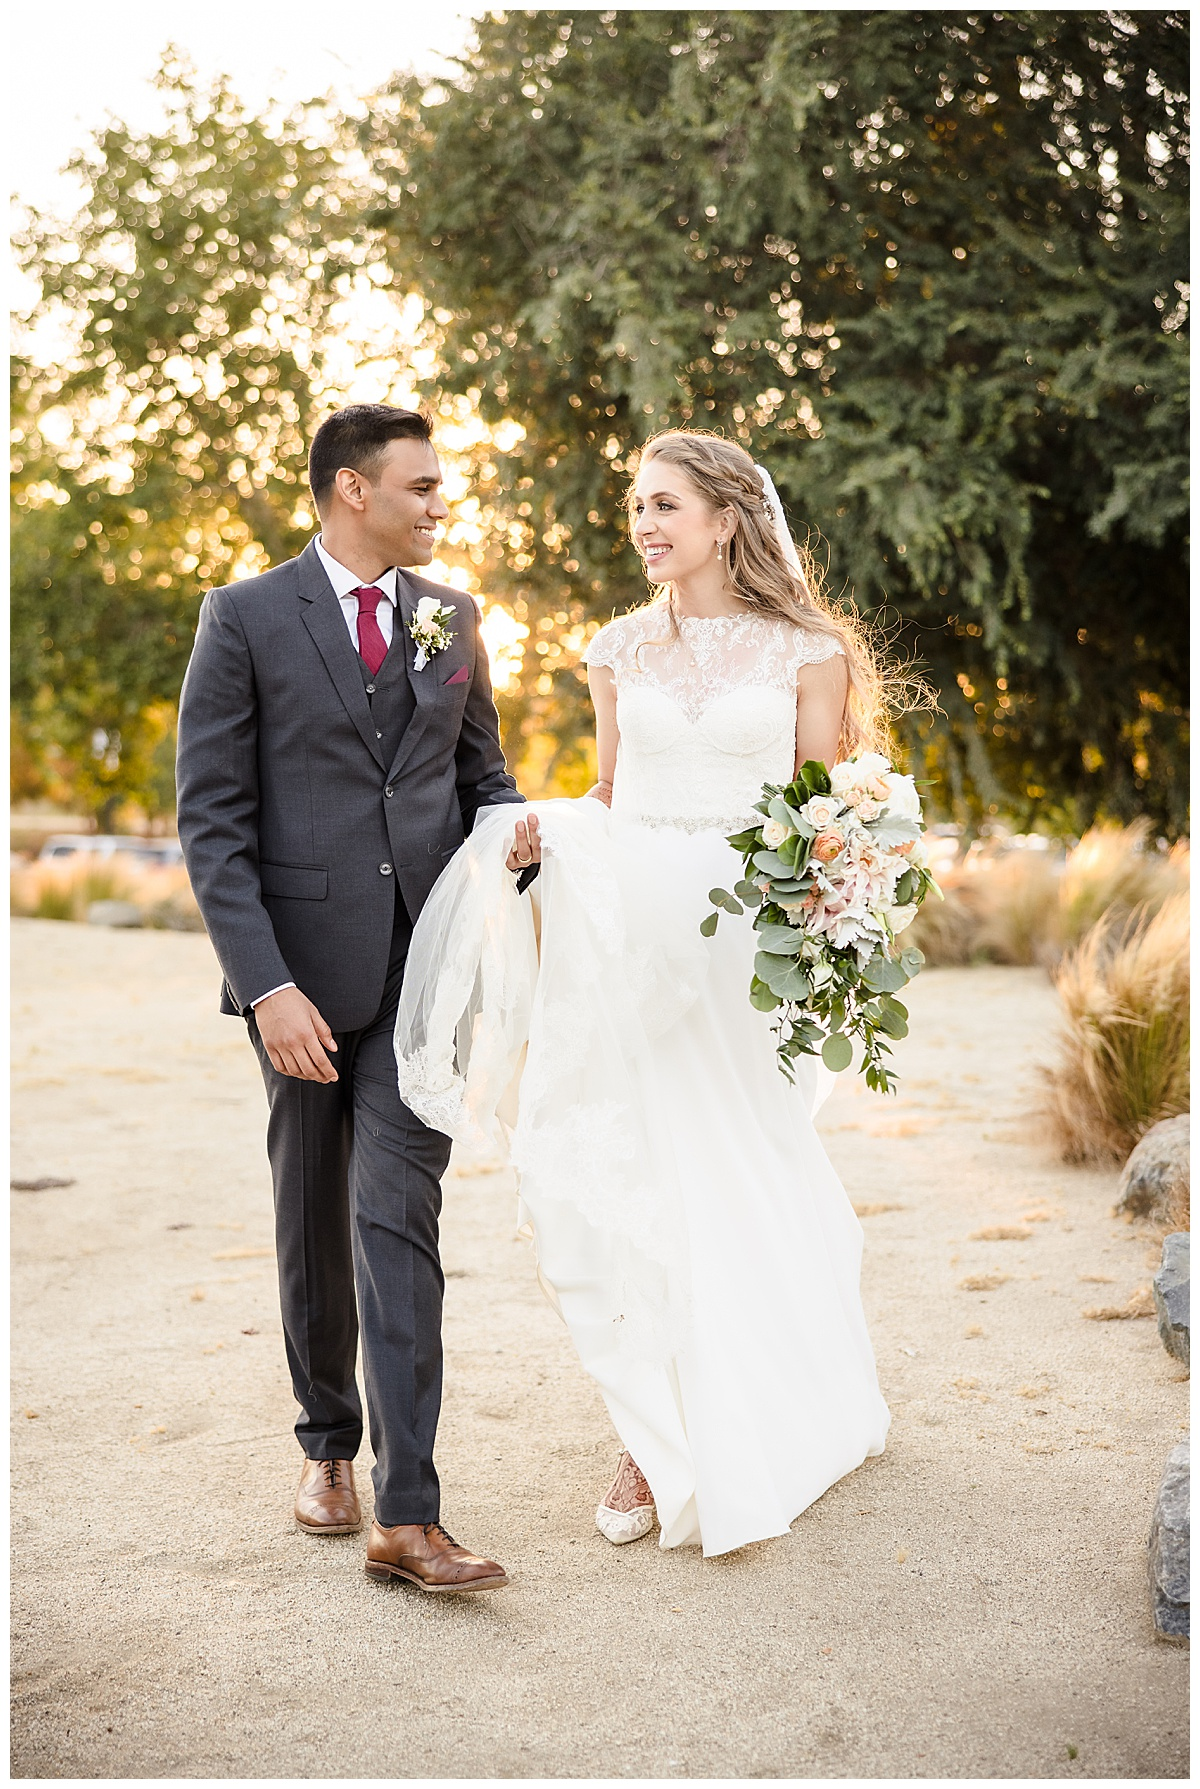 2533 LR Wedgewood Gallaway Downs Temecula Indian Wedding Photography